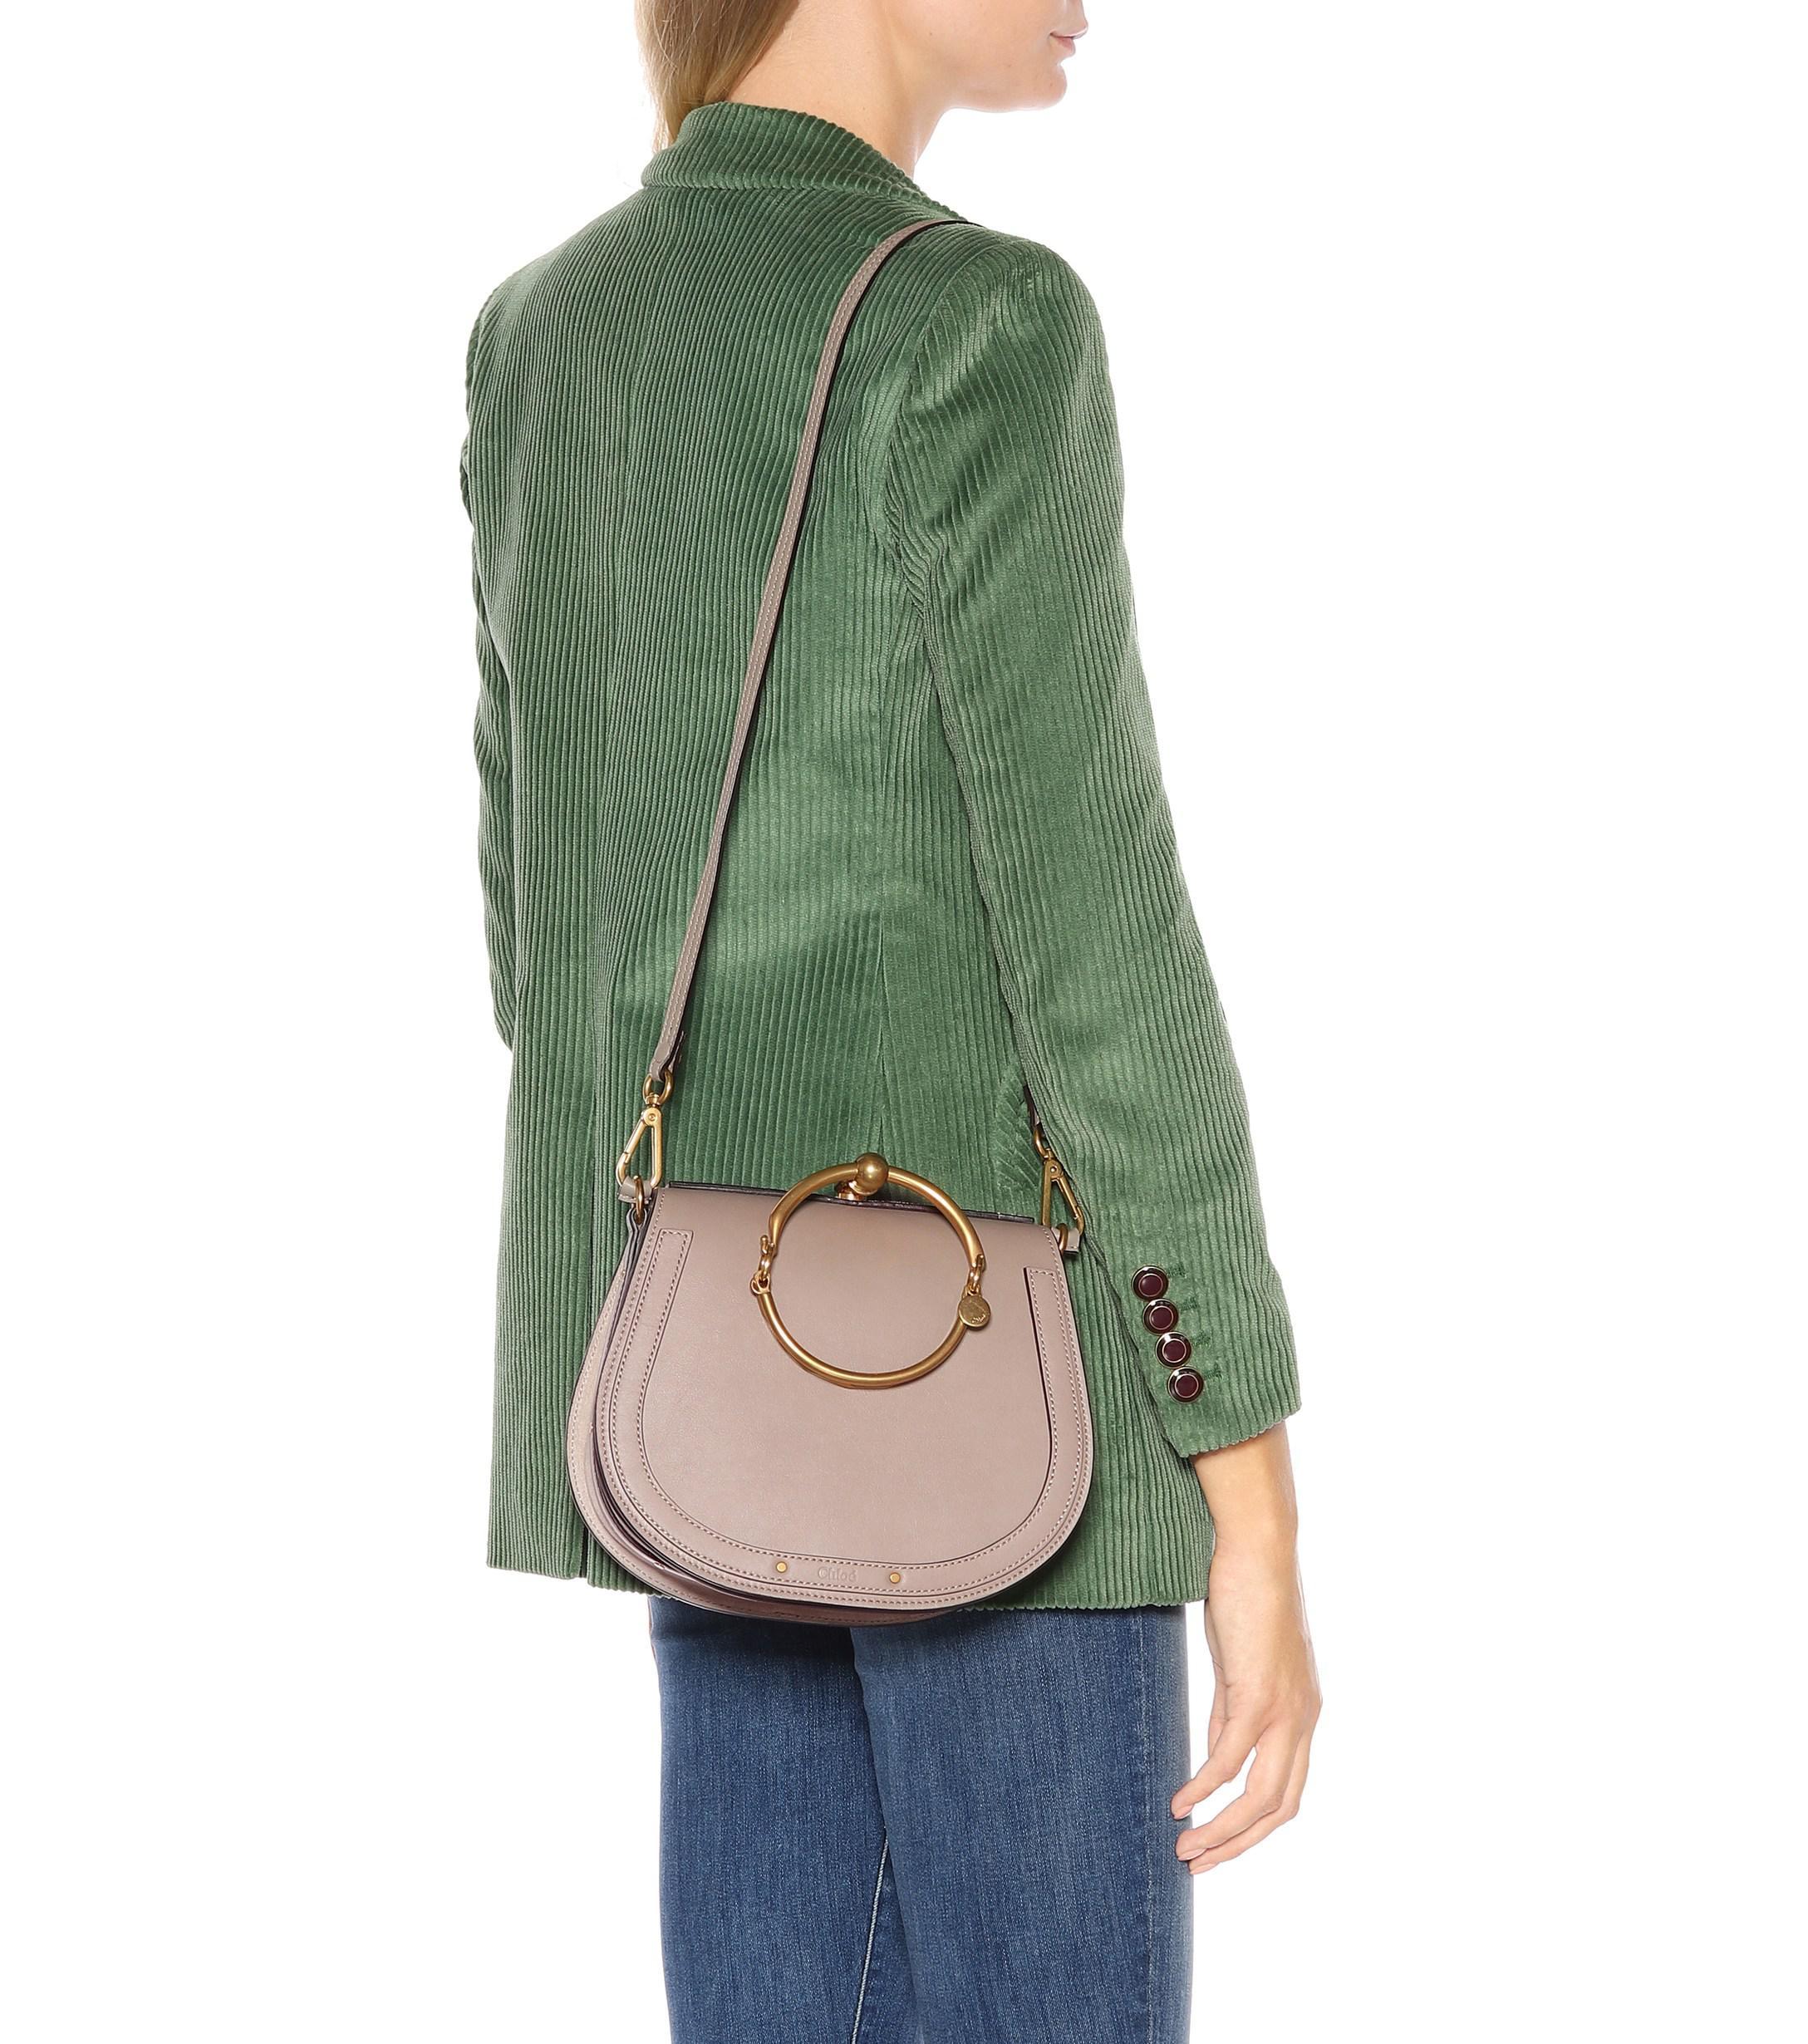 2a5f5d1bc352 Chloé - Multicolor Medium Nile Leather Bracelet Bag - Lyst. View fullscreen